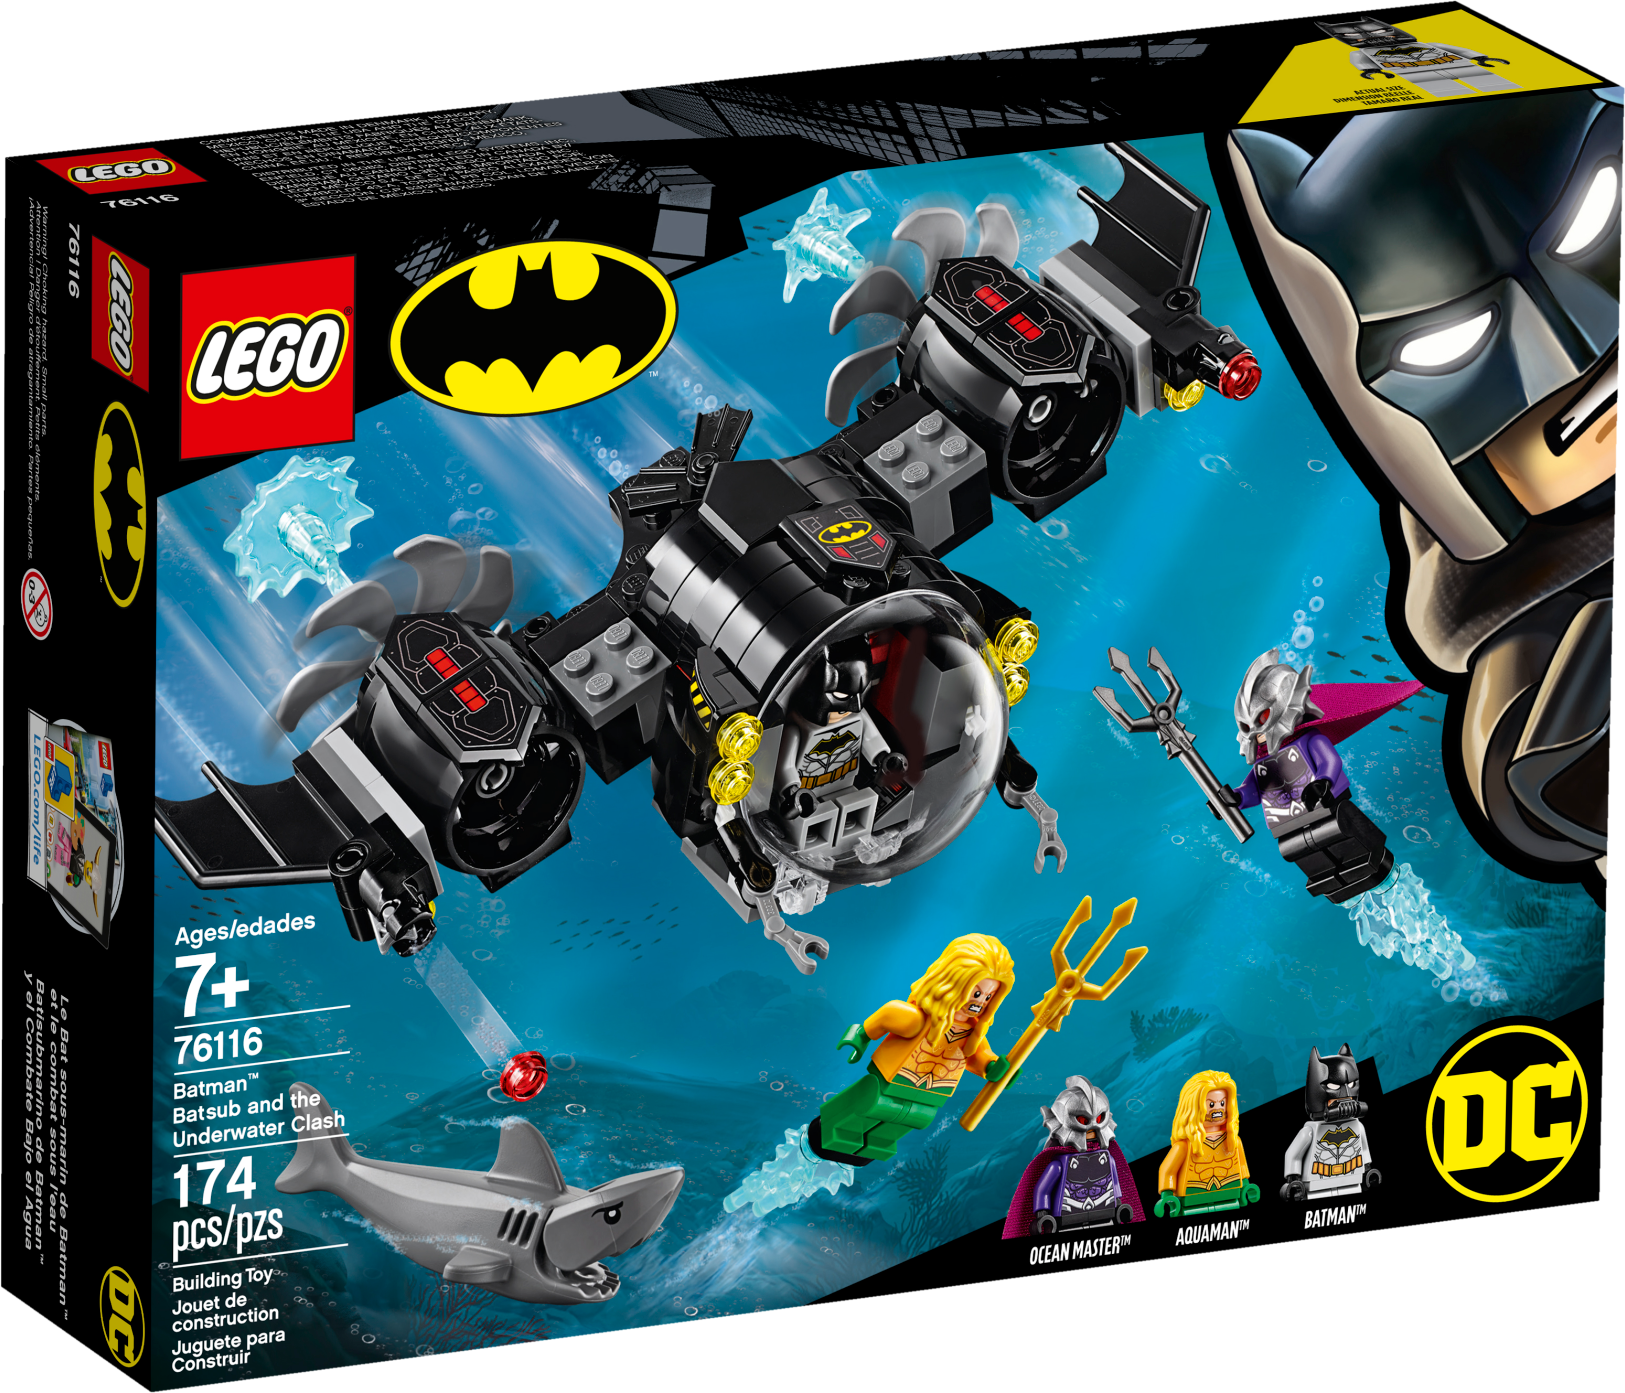 Batman™ Batsub and the Underwater Clash